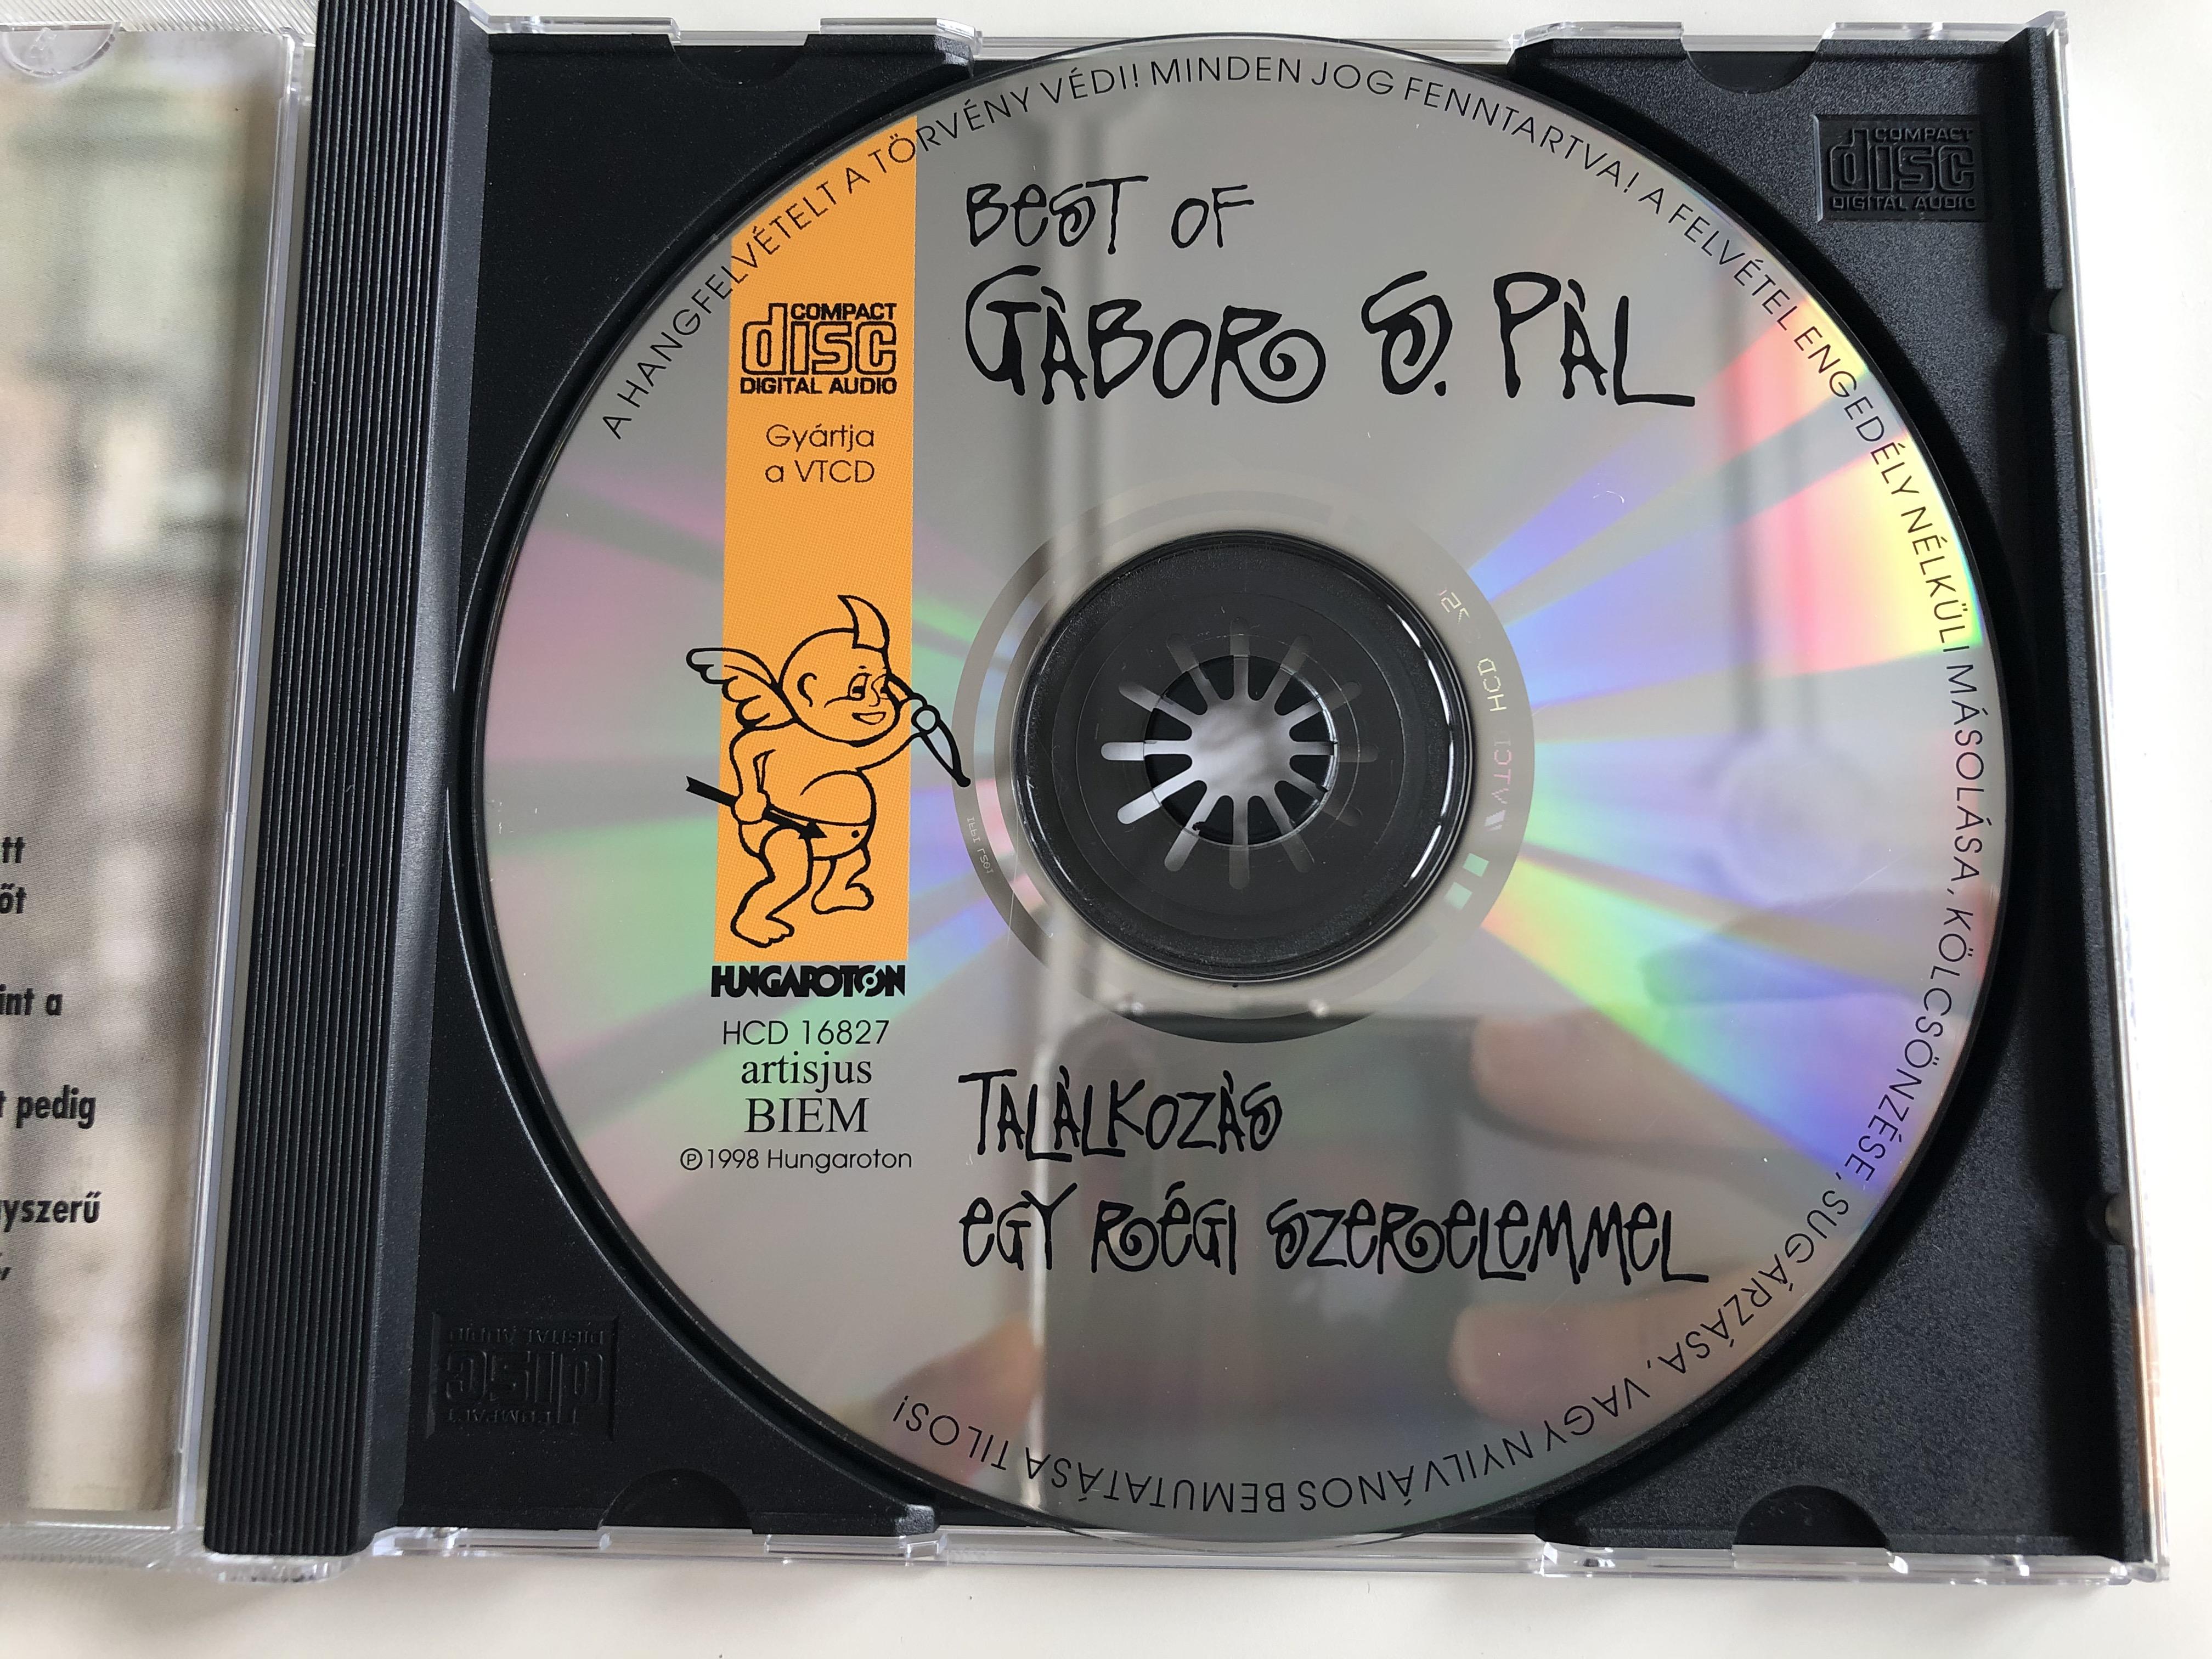 best-of-g-bor-s.-p-l-tal-lkoz-s-egy-r-gi-szerelemmel-hany-ejjel-vartam-gy-szeretn-m-megh-l-lni-nem-lehet-boldogs-got-venni-himnusz-a-ny-rhoz-hungaroton-audio-cd-1998-hcd-16827-6-.jpg